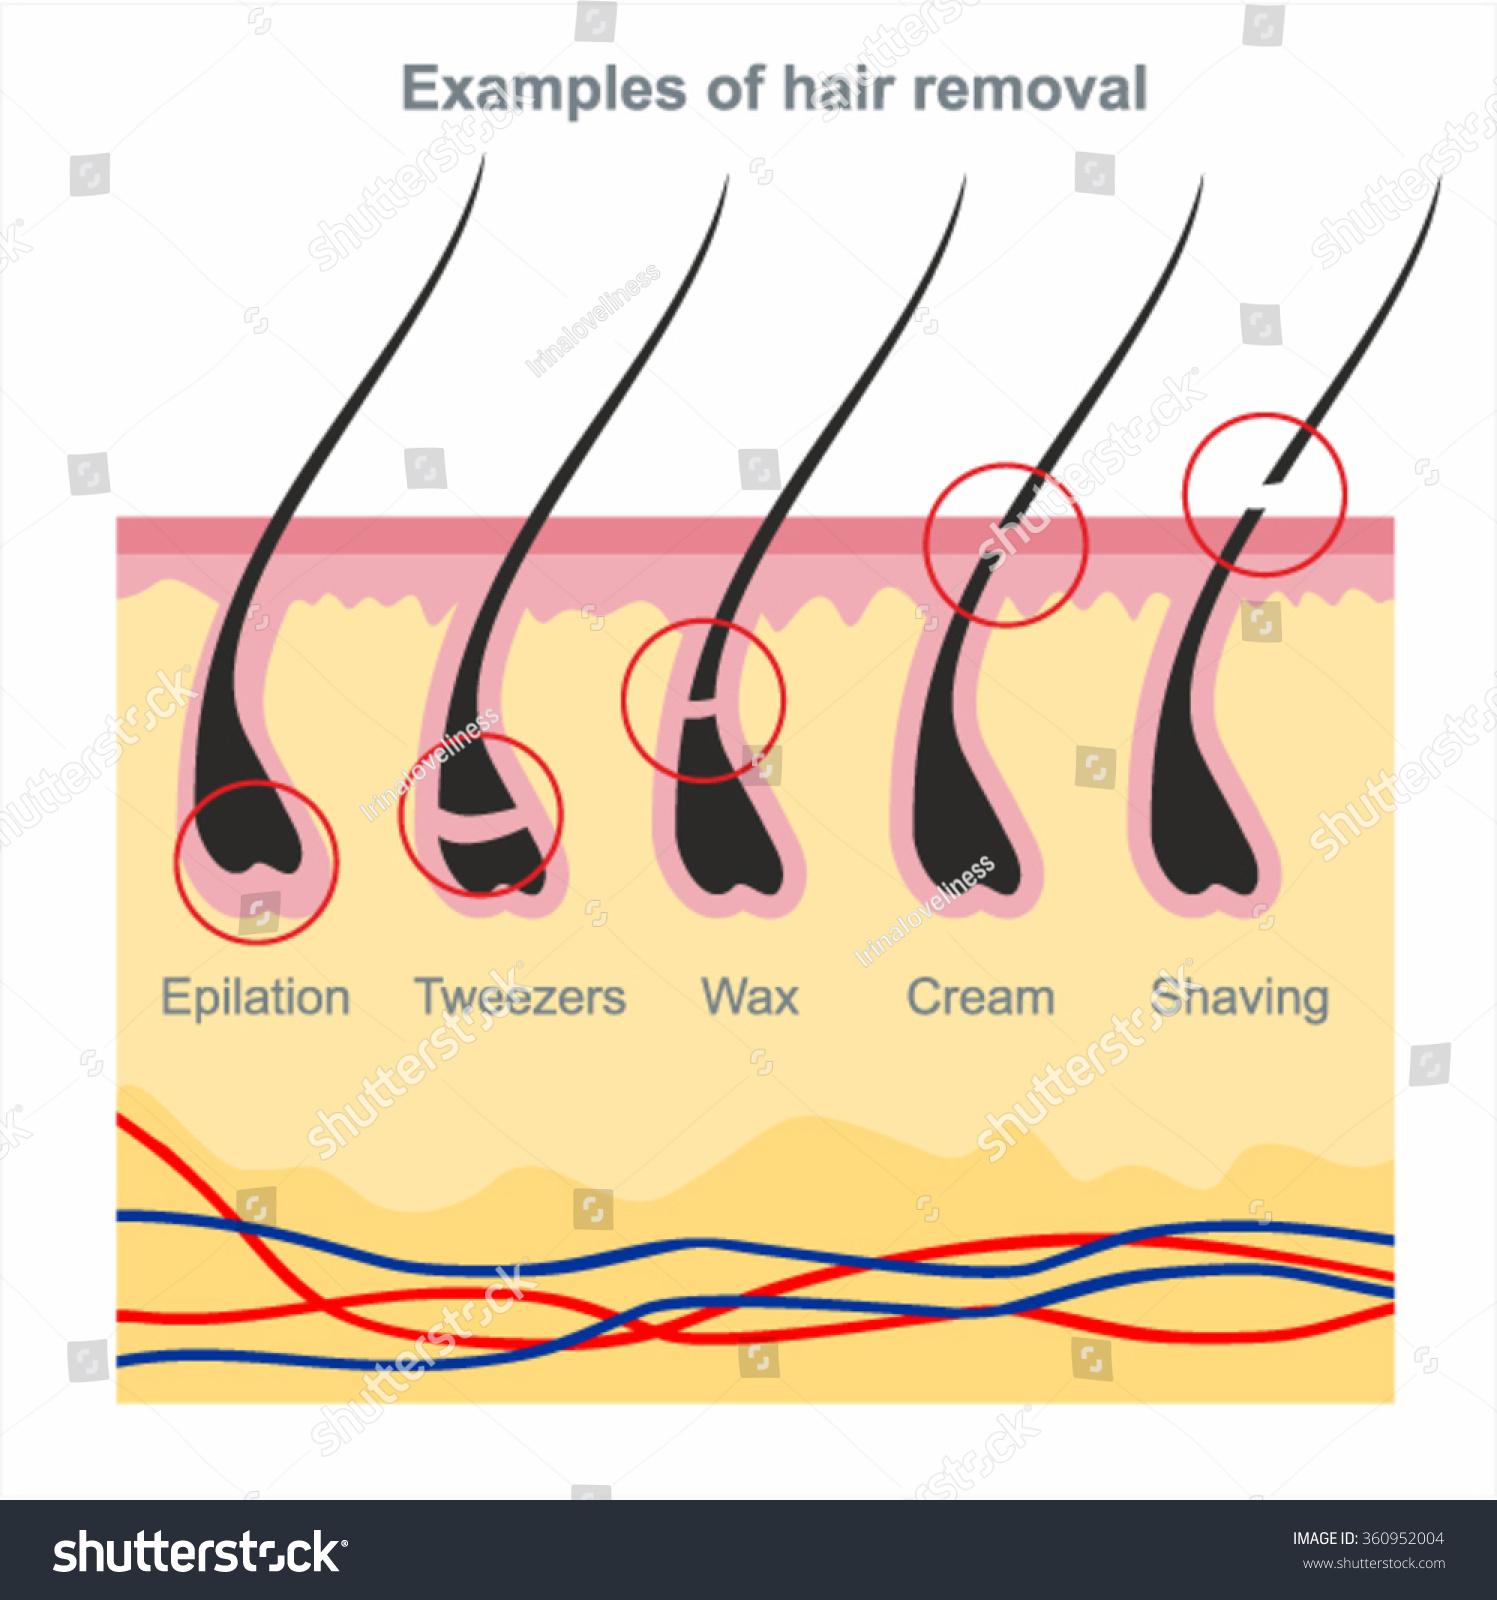 Examples Hair Removal Waxing Shaving Tweezers Stock Vector 360952004